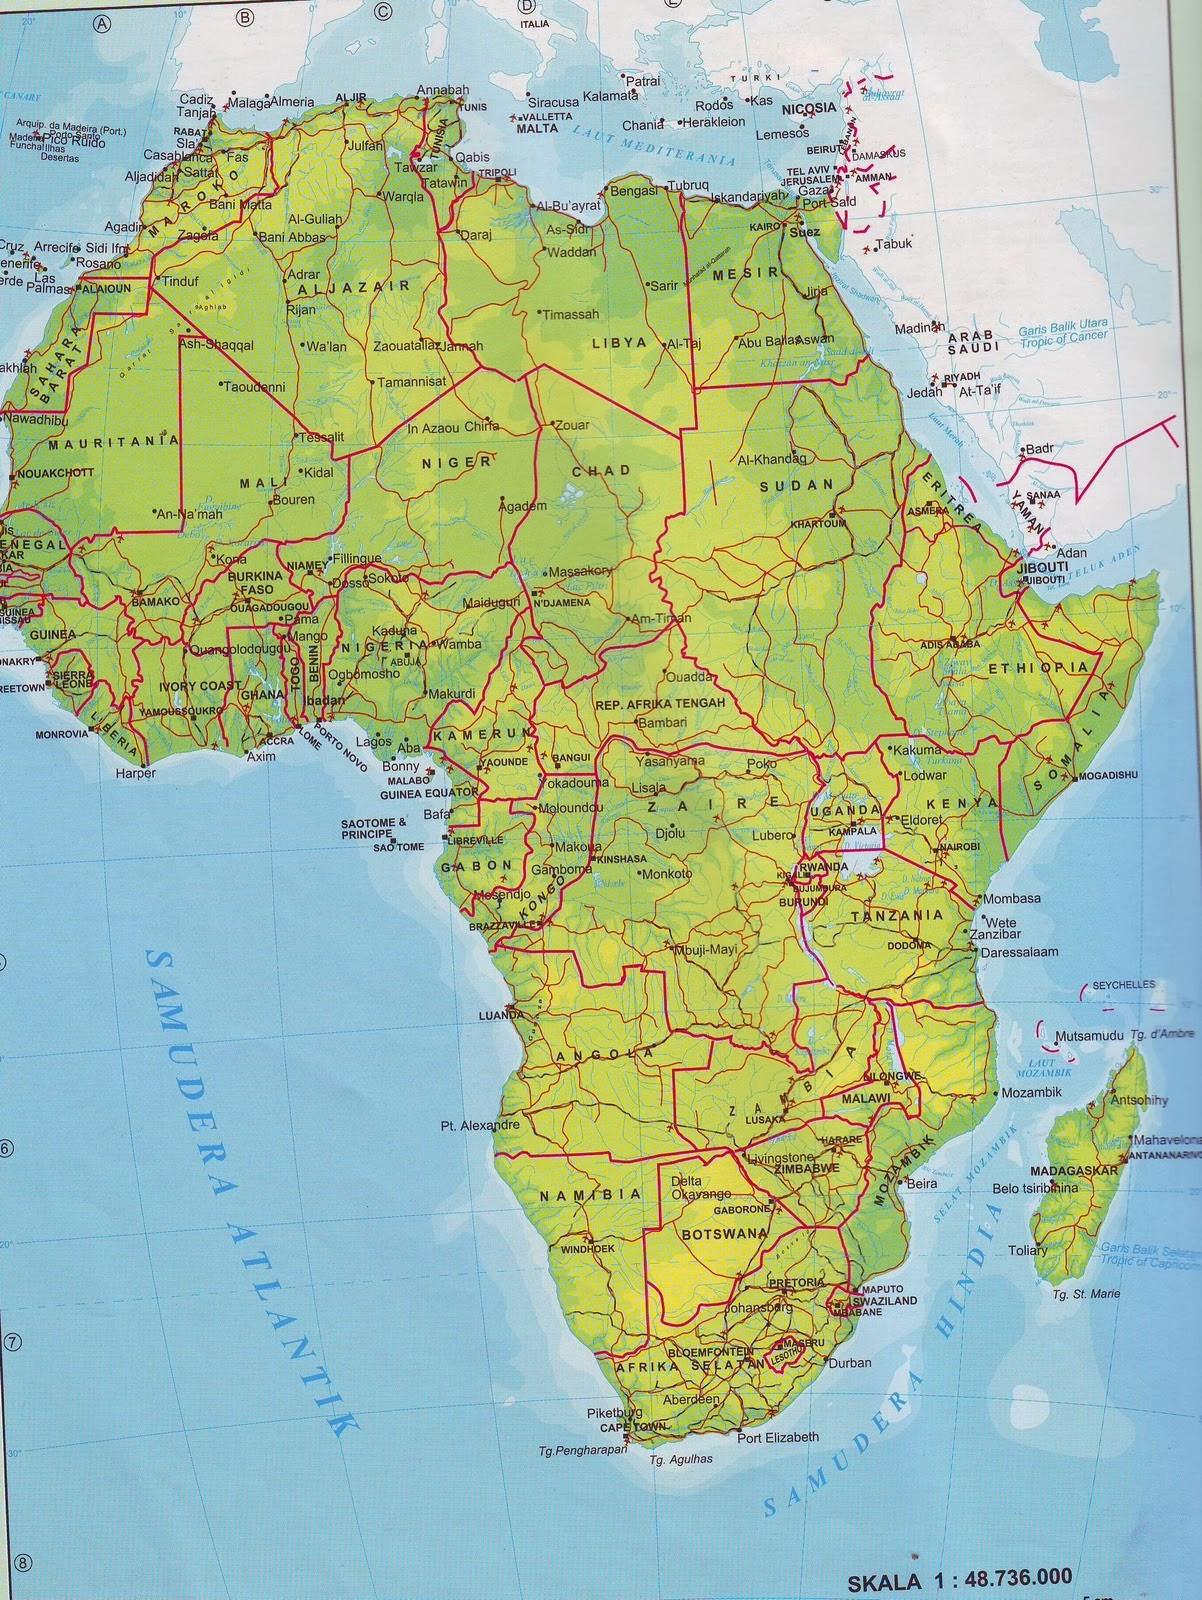 Letak Geografis Benua Afrika : letak, geografis, benua, afrika, BENUA, AFRIKA, Geography, Quizizz